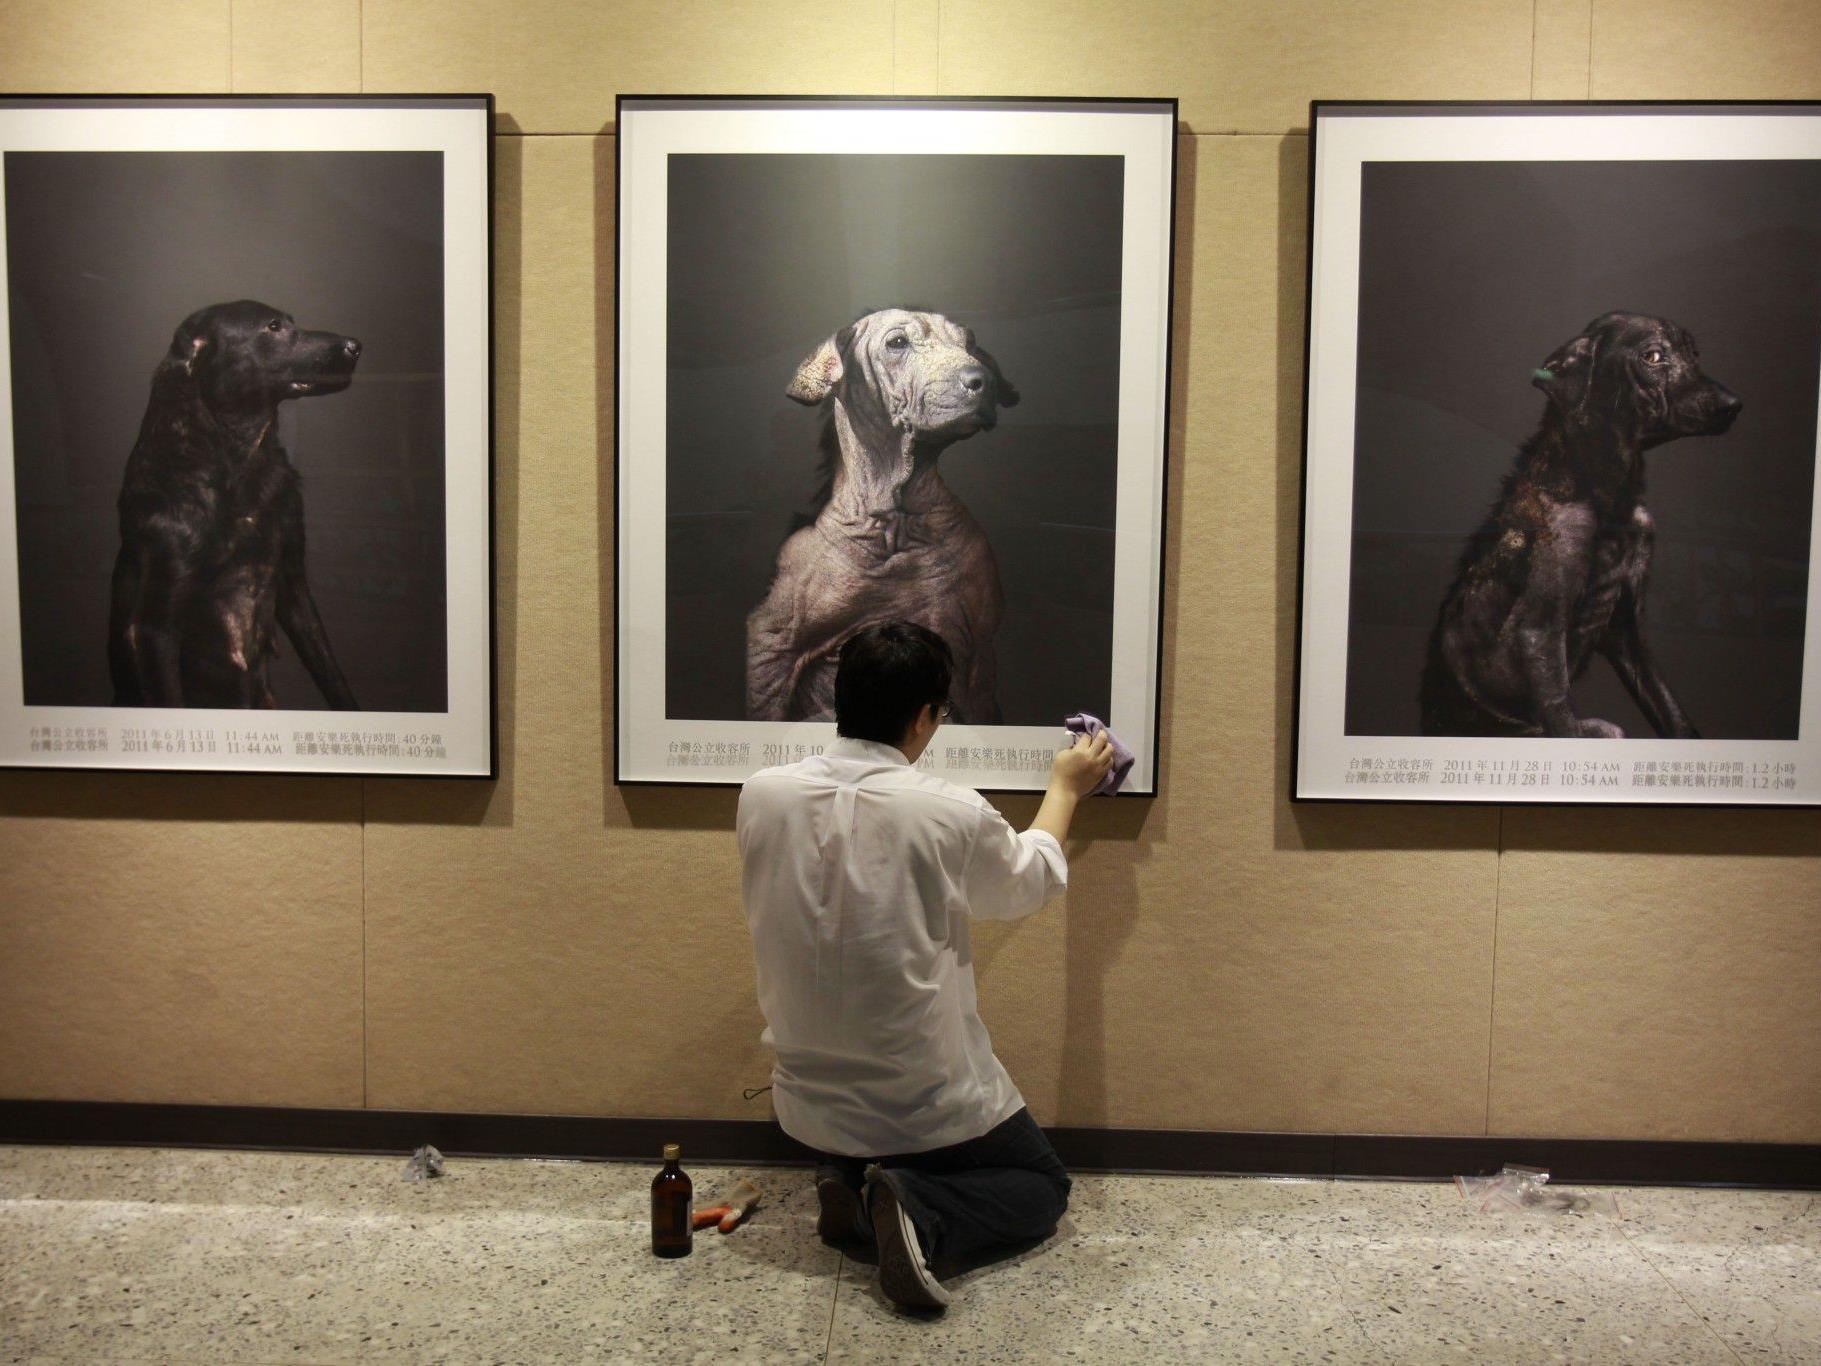 Tou Chih-Kang hält in den Fotos die letzten Minuten der Hunde fest.